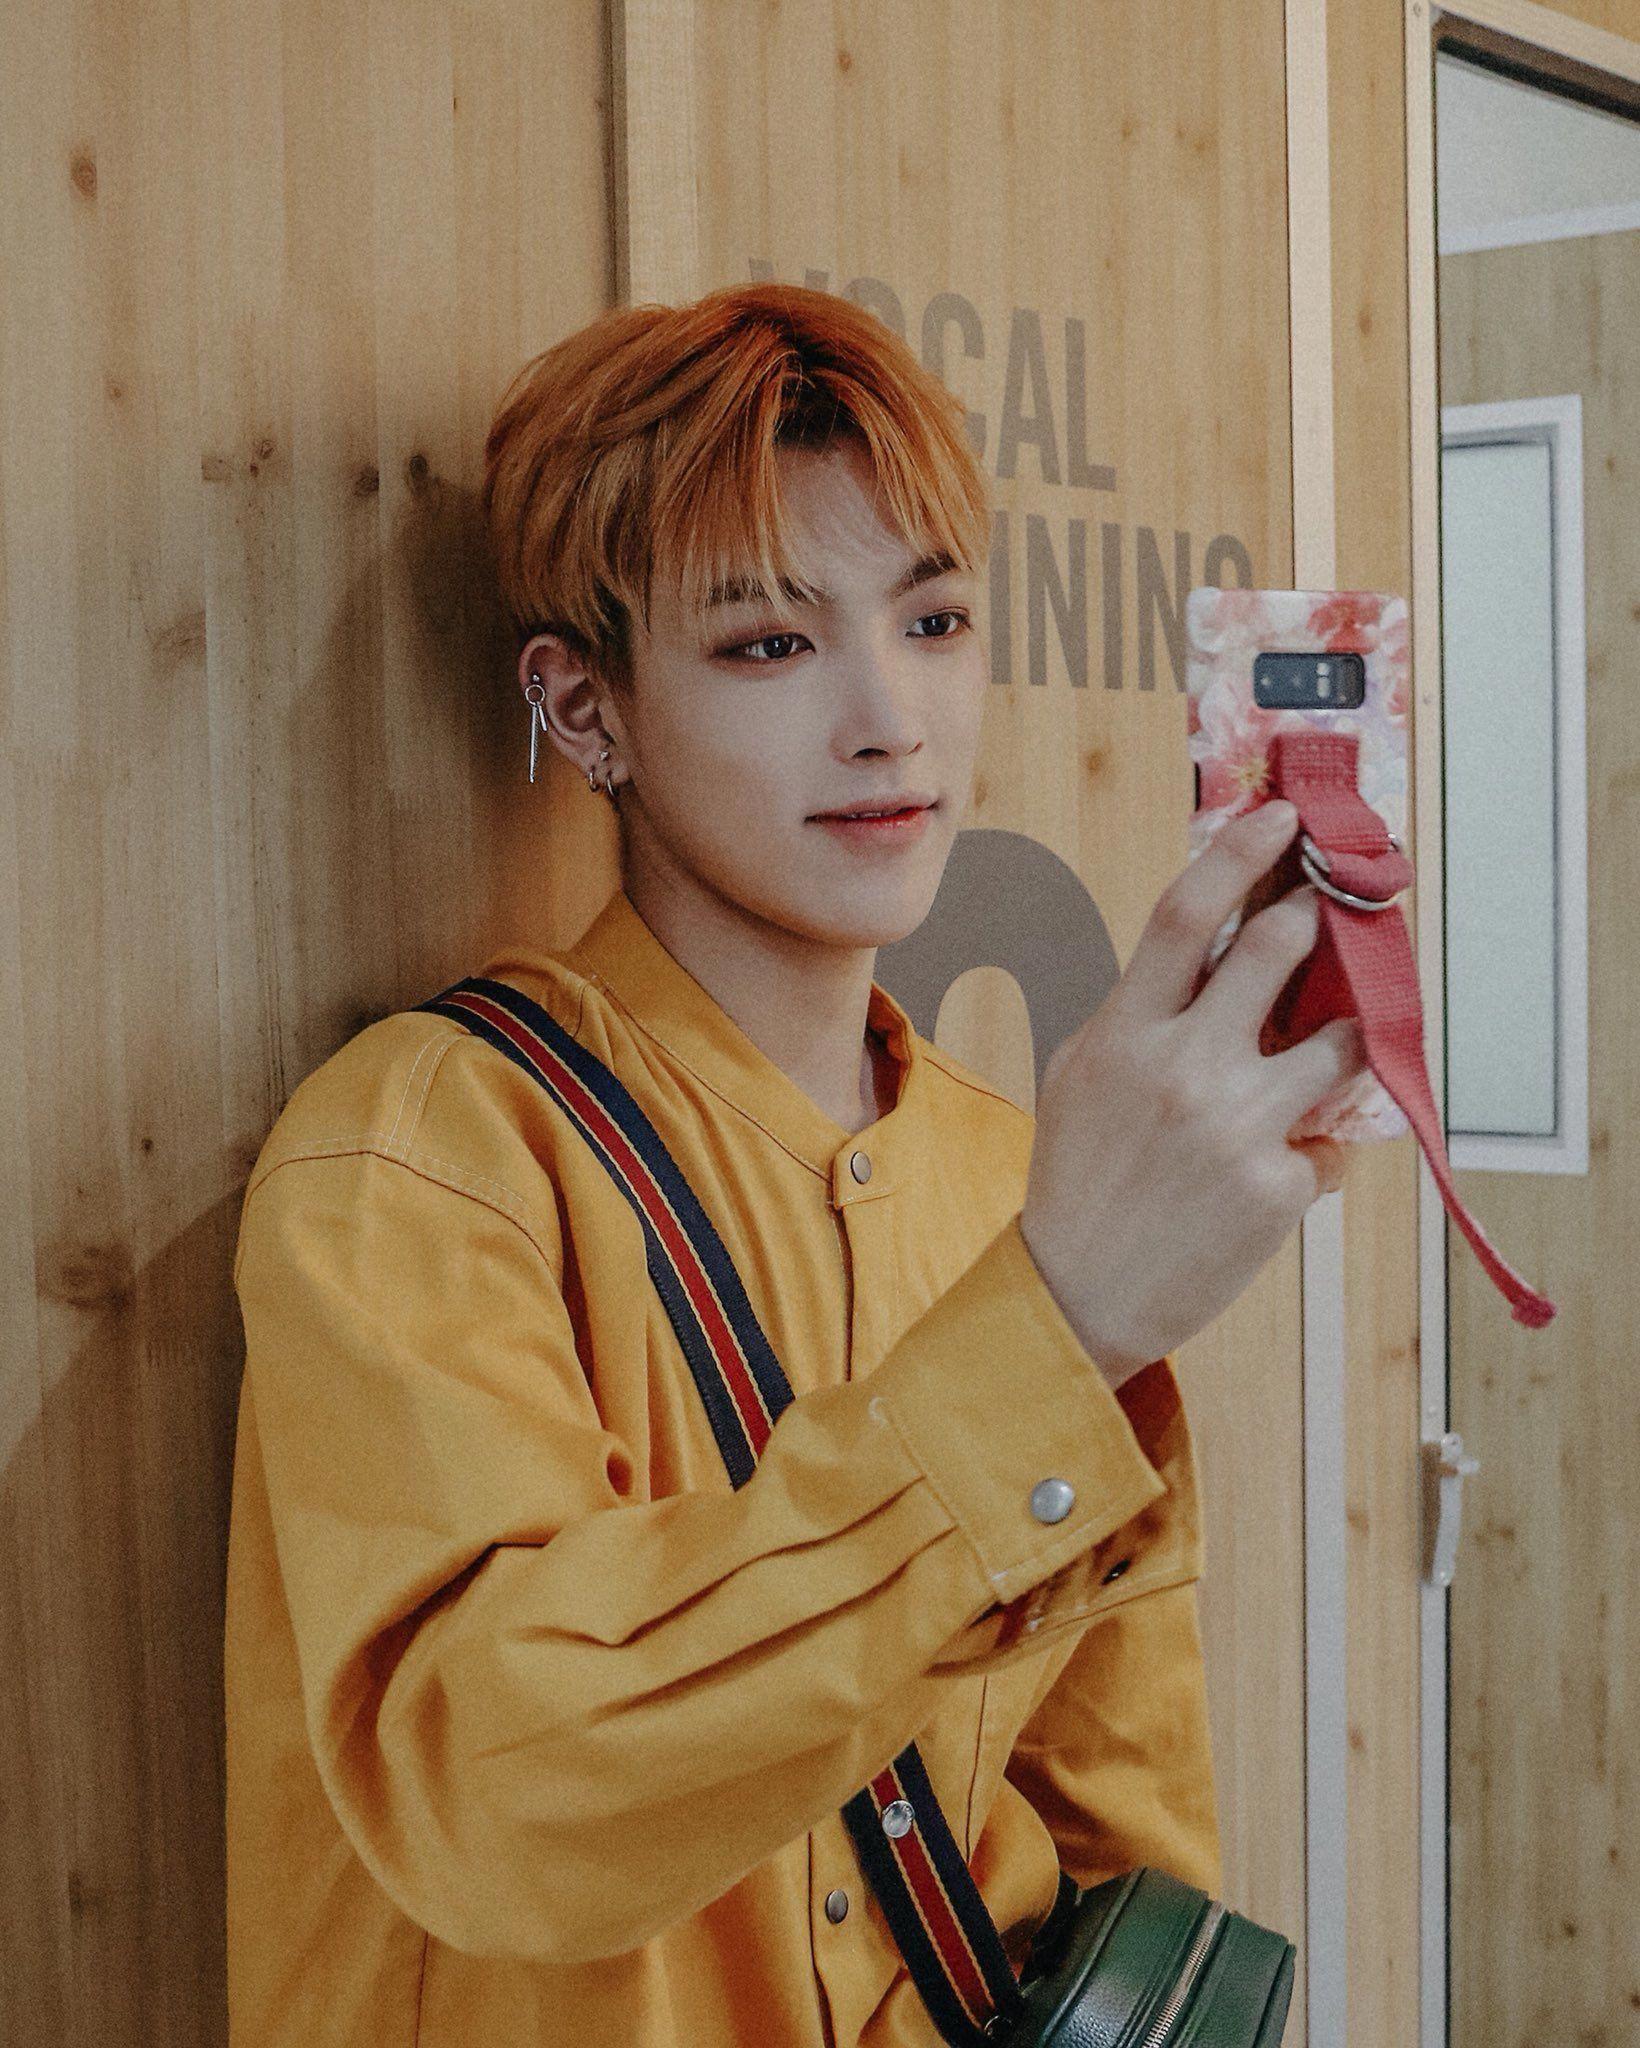 Boy Meets World 90s Fashion Toddlersfashion2018 Refferal 2789513603 1yearoldboyfashion Kim Hongjoong Jung Woo Young Boy Bands